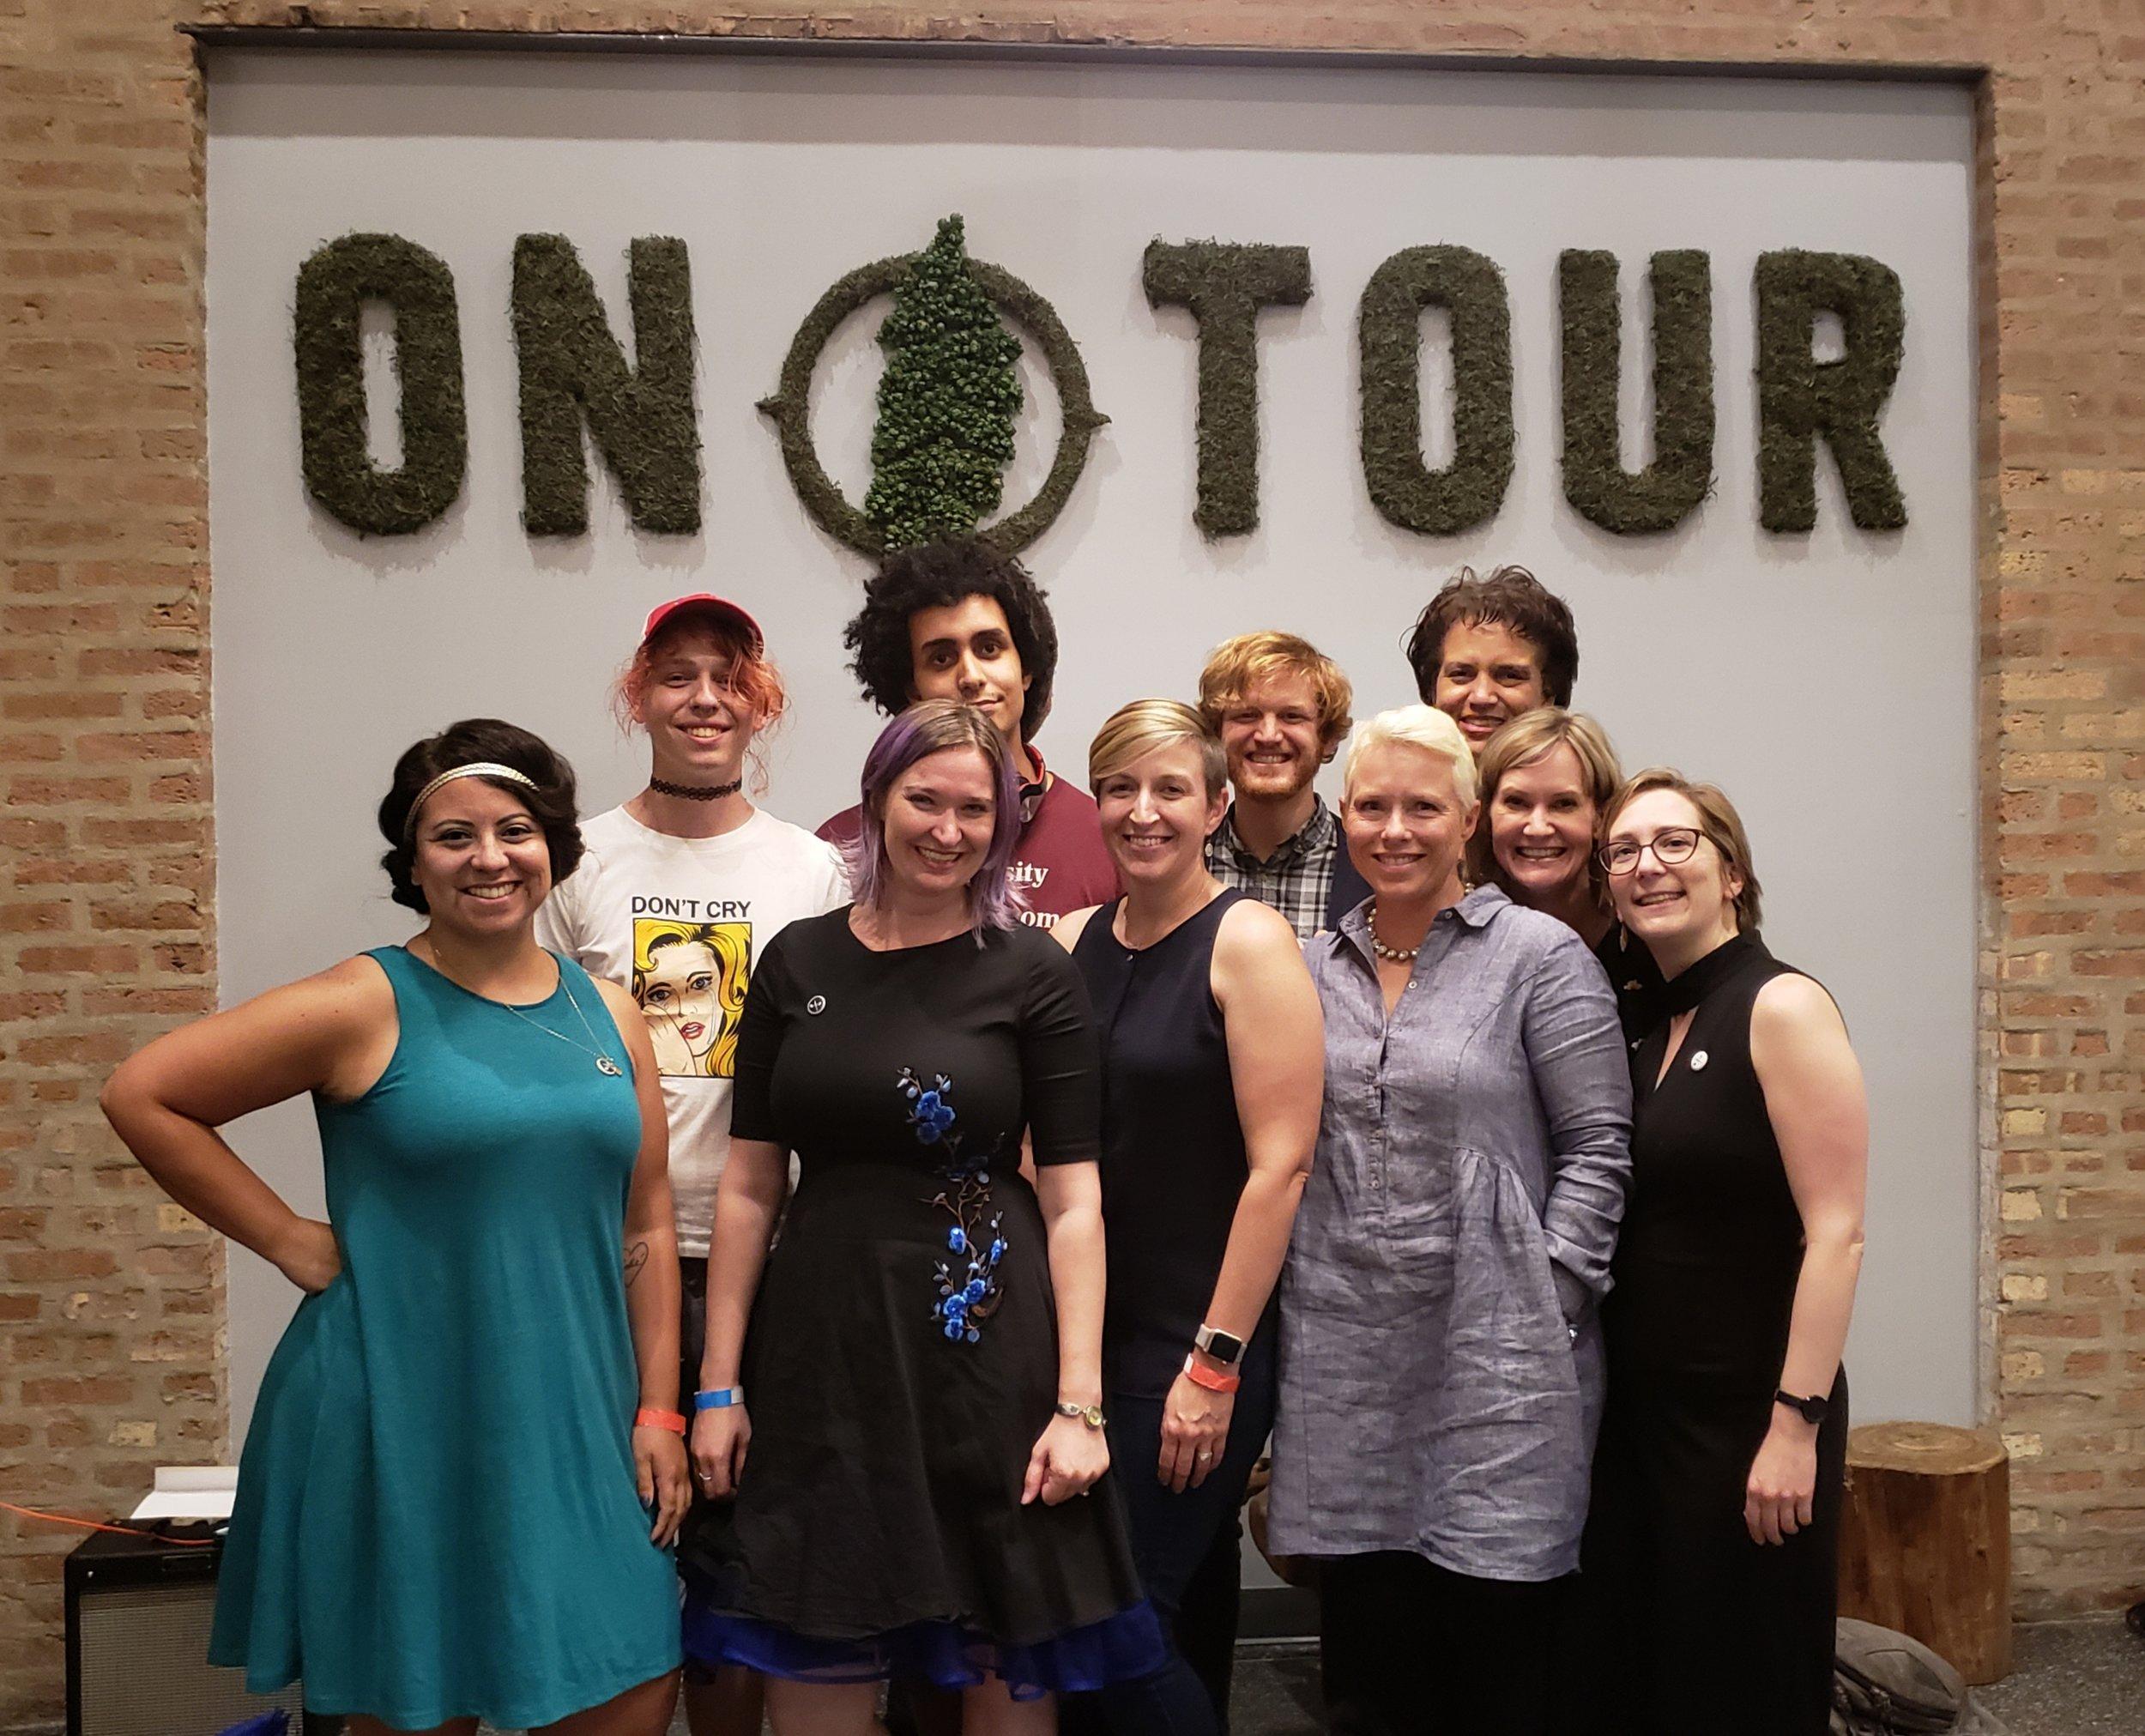 From left: Dee Fuentes, Aubre and Nico of String Figures, Abby Dryer, Lauren Swihart, Chris Walsh, KellyAnn Corcoran, Jade Maze, Anne Johnsos, Christina Brandon.